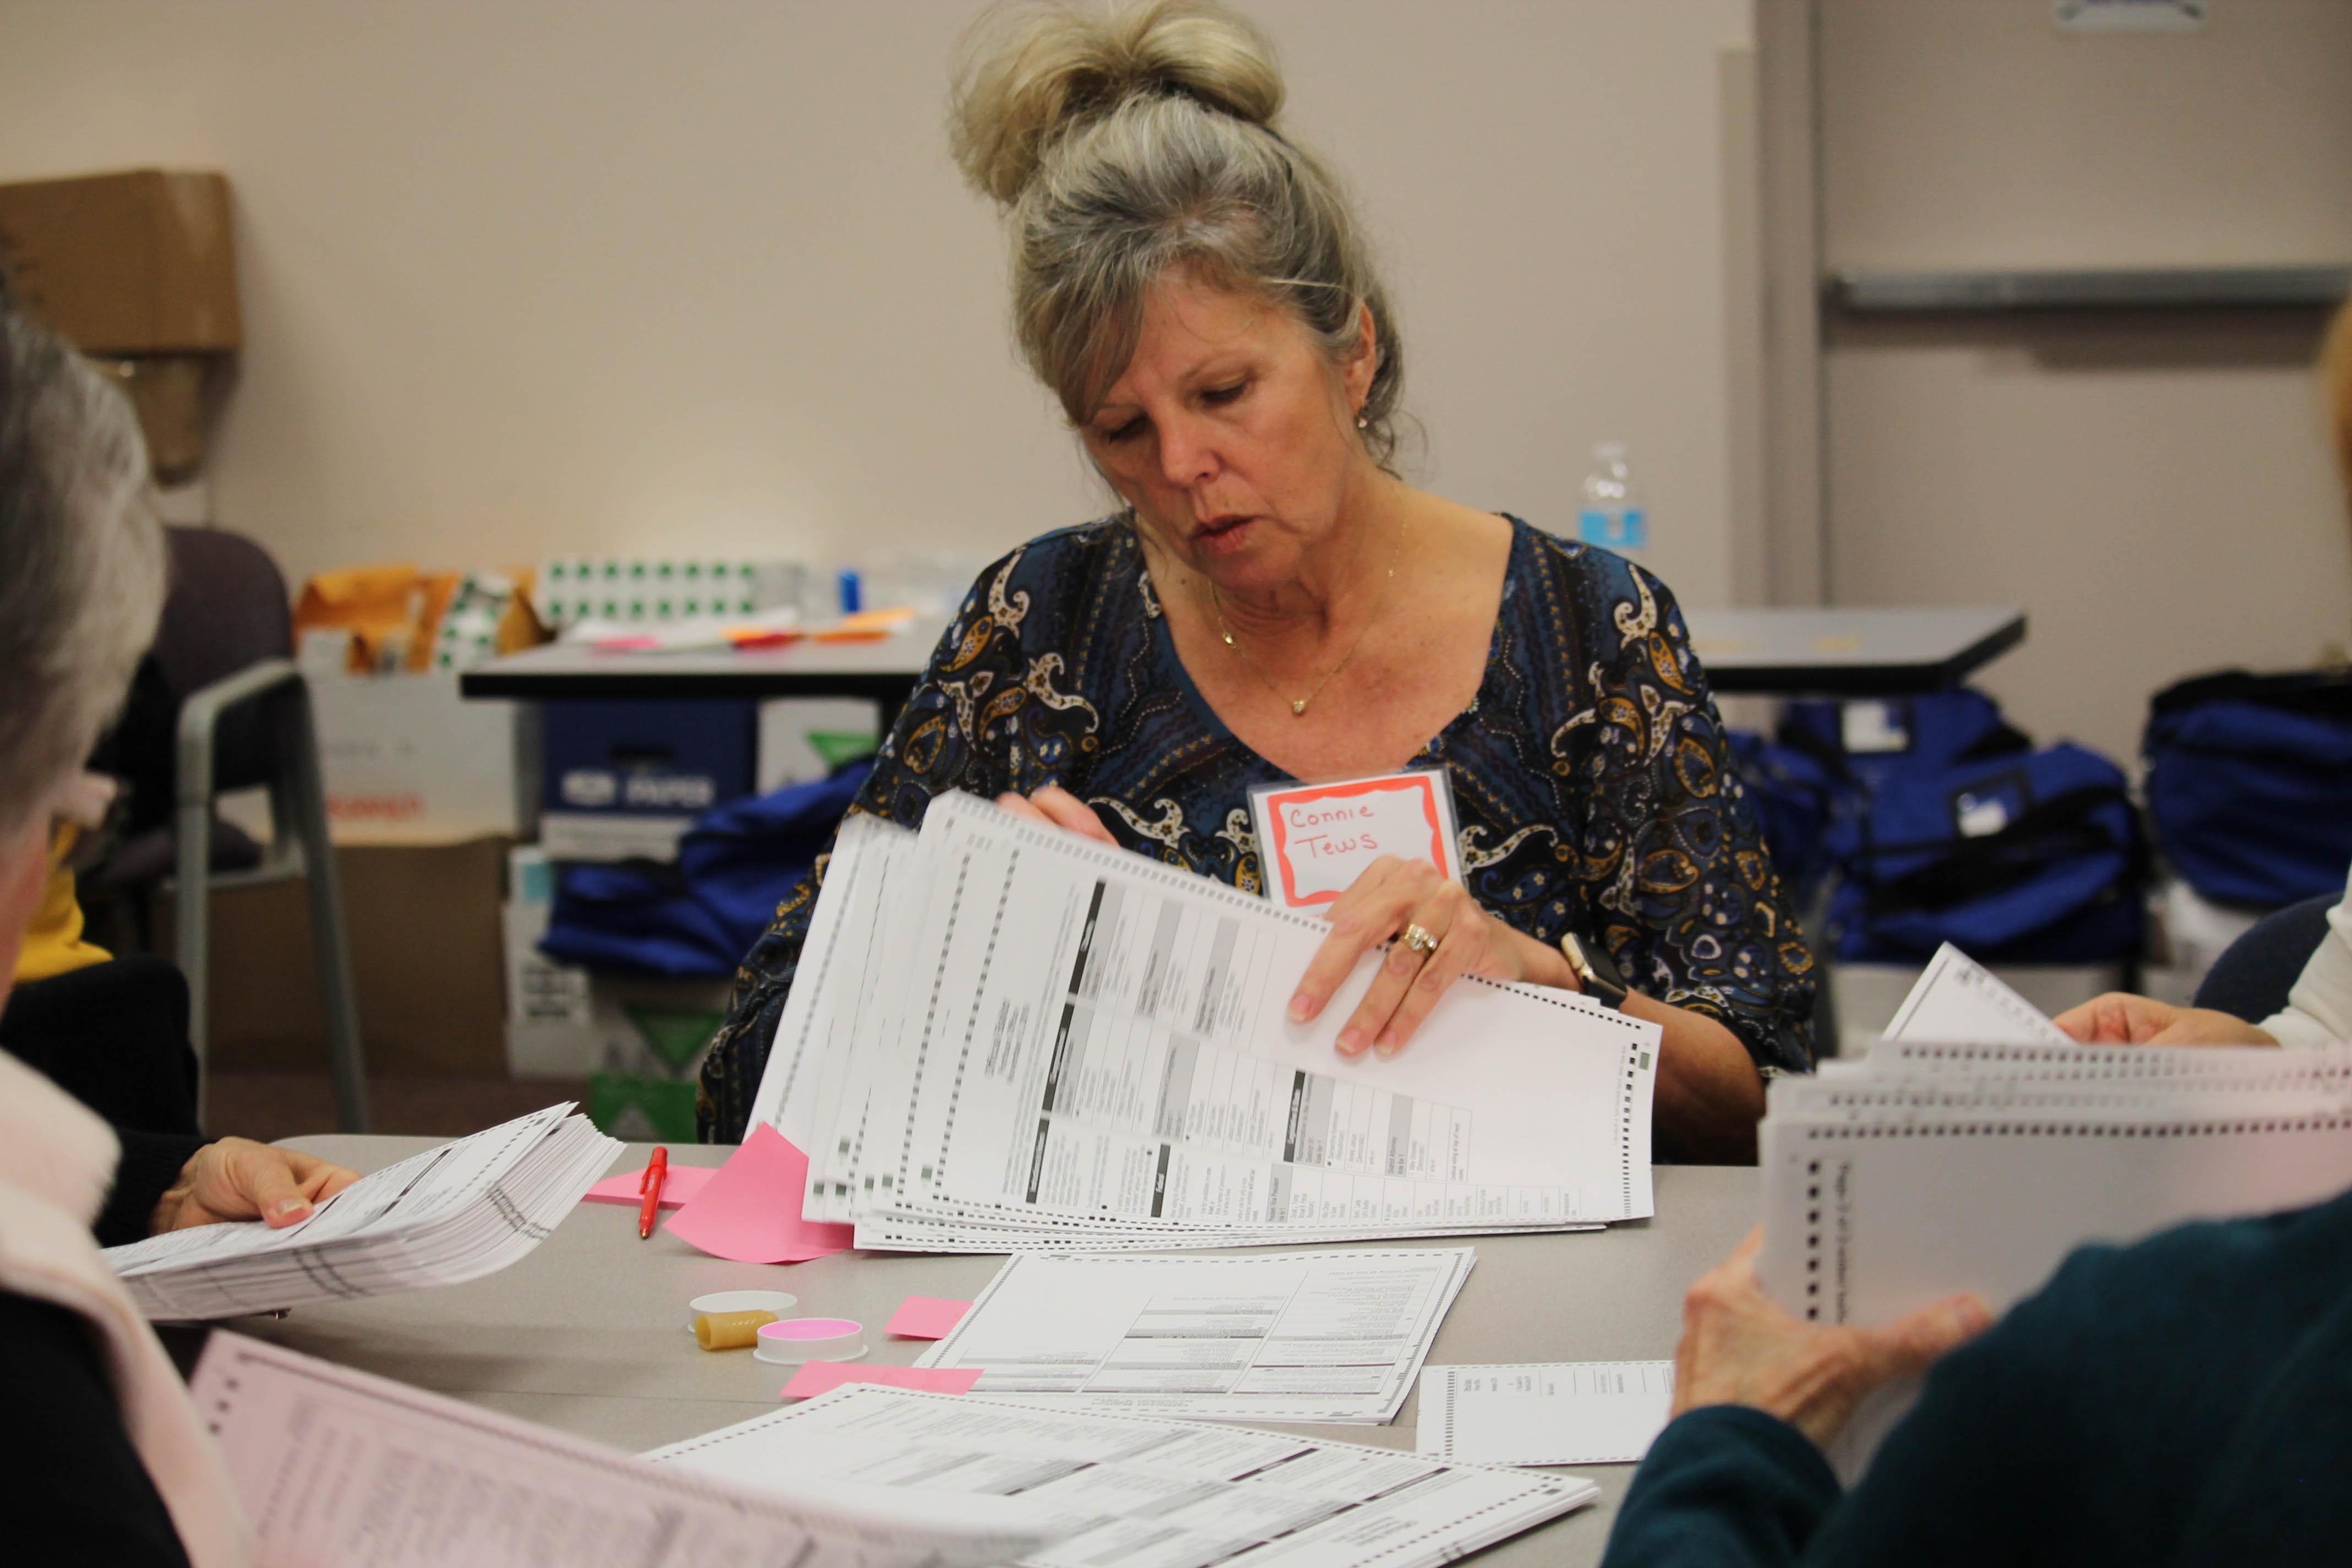 Michigan Election Recount Update: Jill Stein Team, Republicans Clash in Federal Court